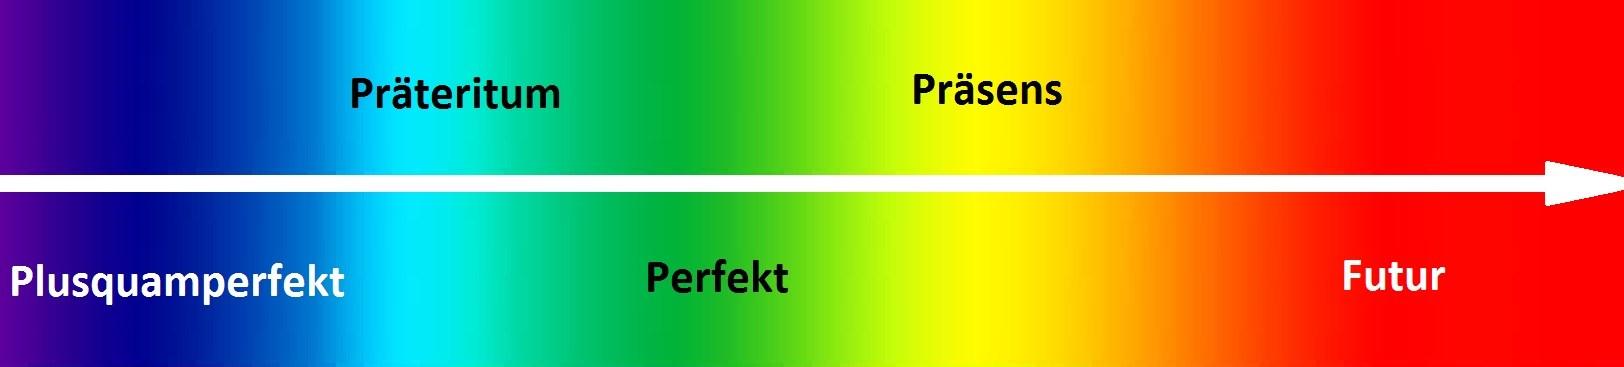 ougiz - Präsens, Präteritum, Perfekt, Plusquamperfekt, Futur I, Futur II